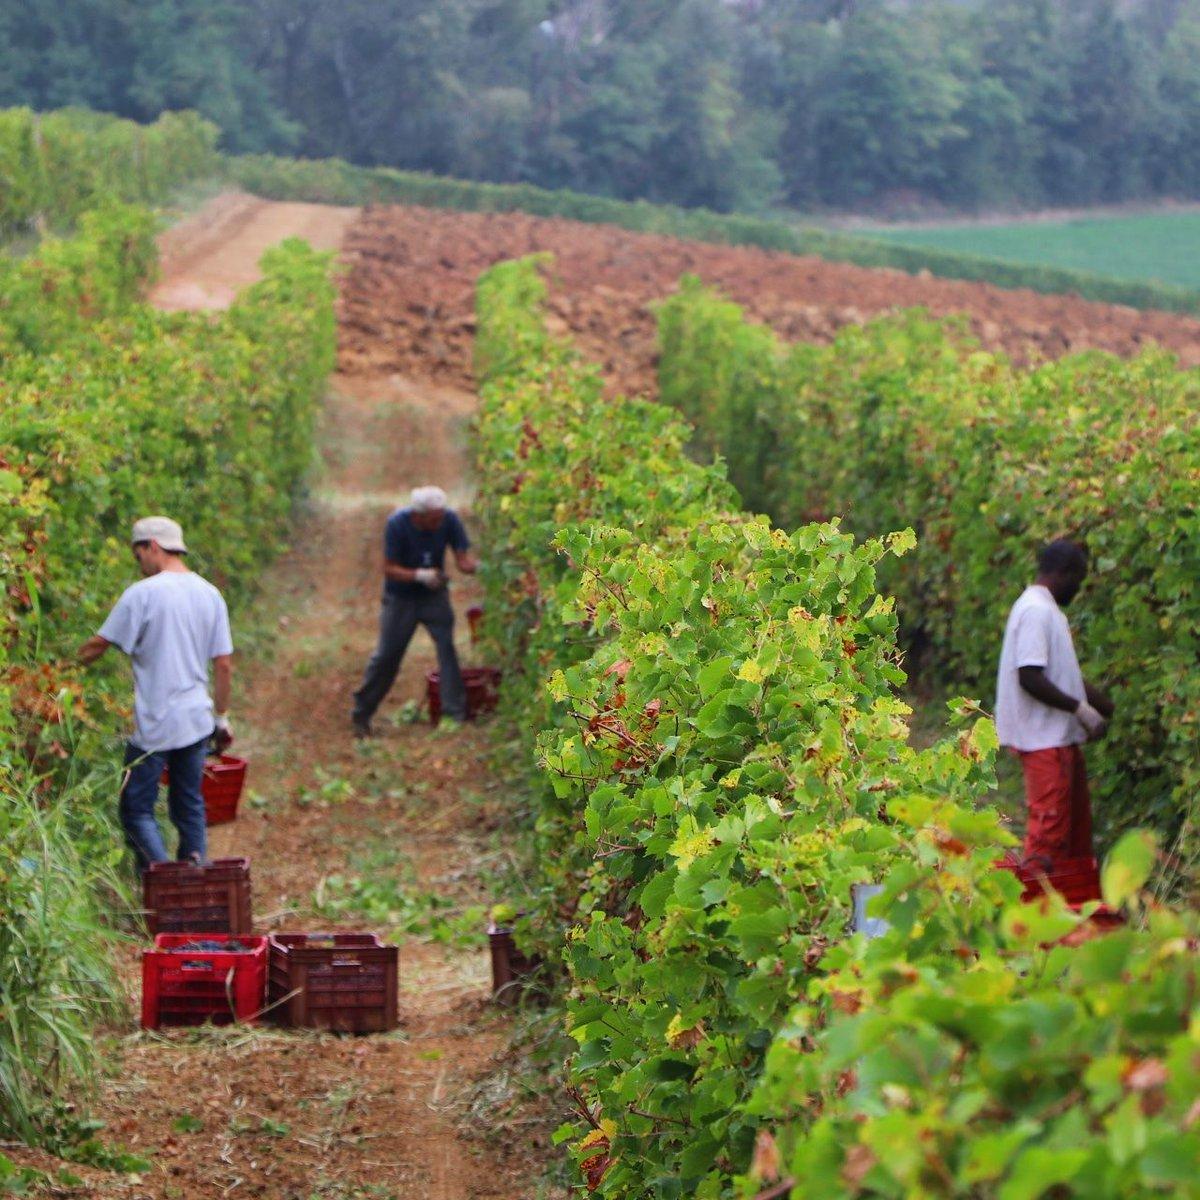 Inizia un altra settimana di vendemmia! #casabenna #vendemmia #harvesting #uva #grapes #vigneto #vineyards #amano #handpicked #raccoltaamano #piacenza #castellarquato #valdarda #gutturnio #barbera #bonarda #croatina  - Ukustom